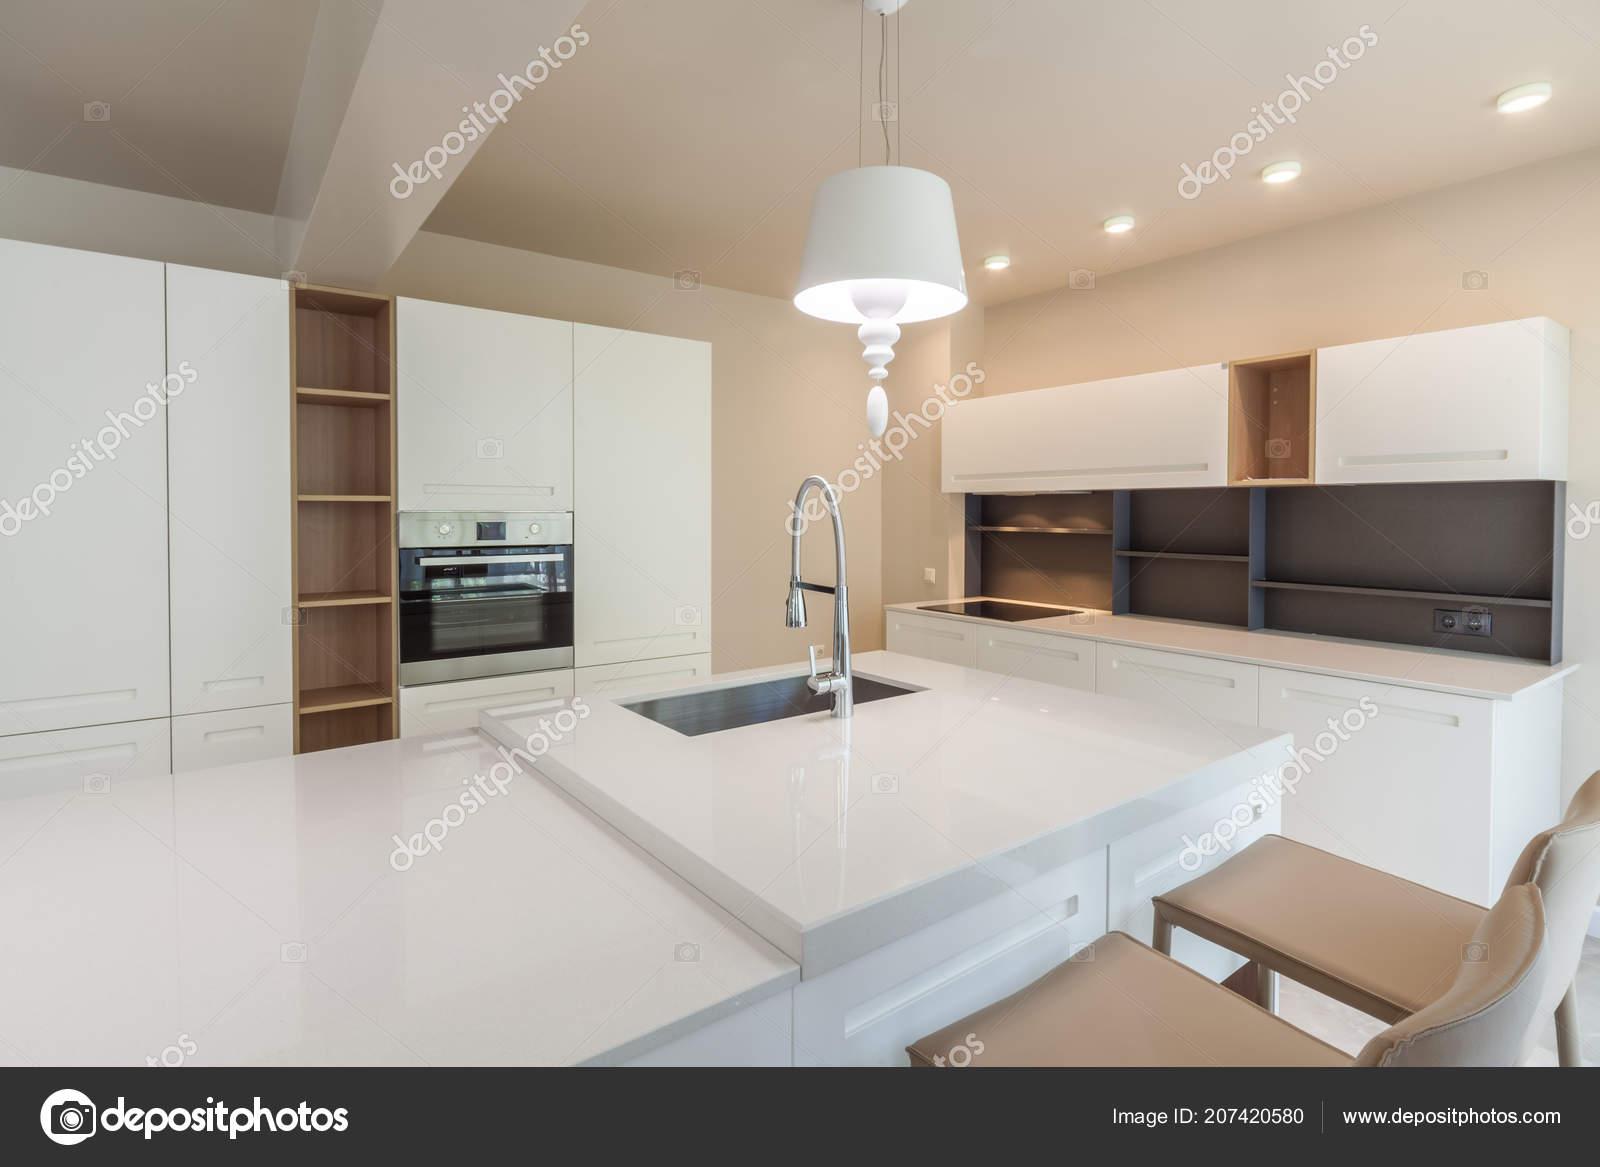 Casa Moderna Bianca.Nuova Cucina Bianca Moderna Nuova Casa Lusso Fotografia